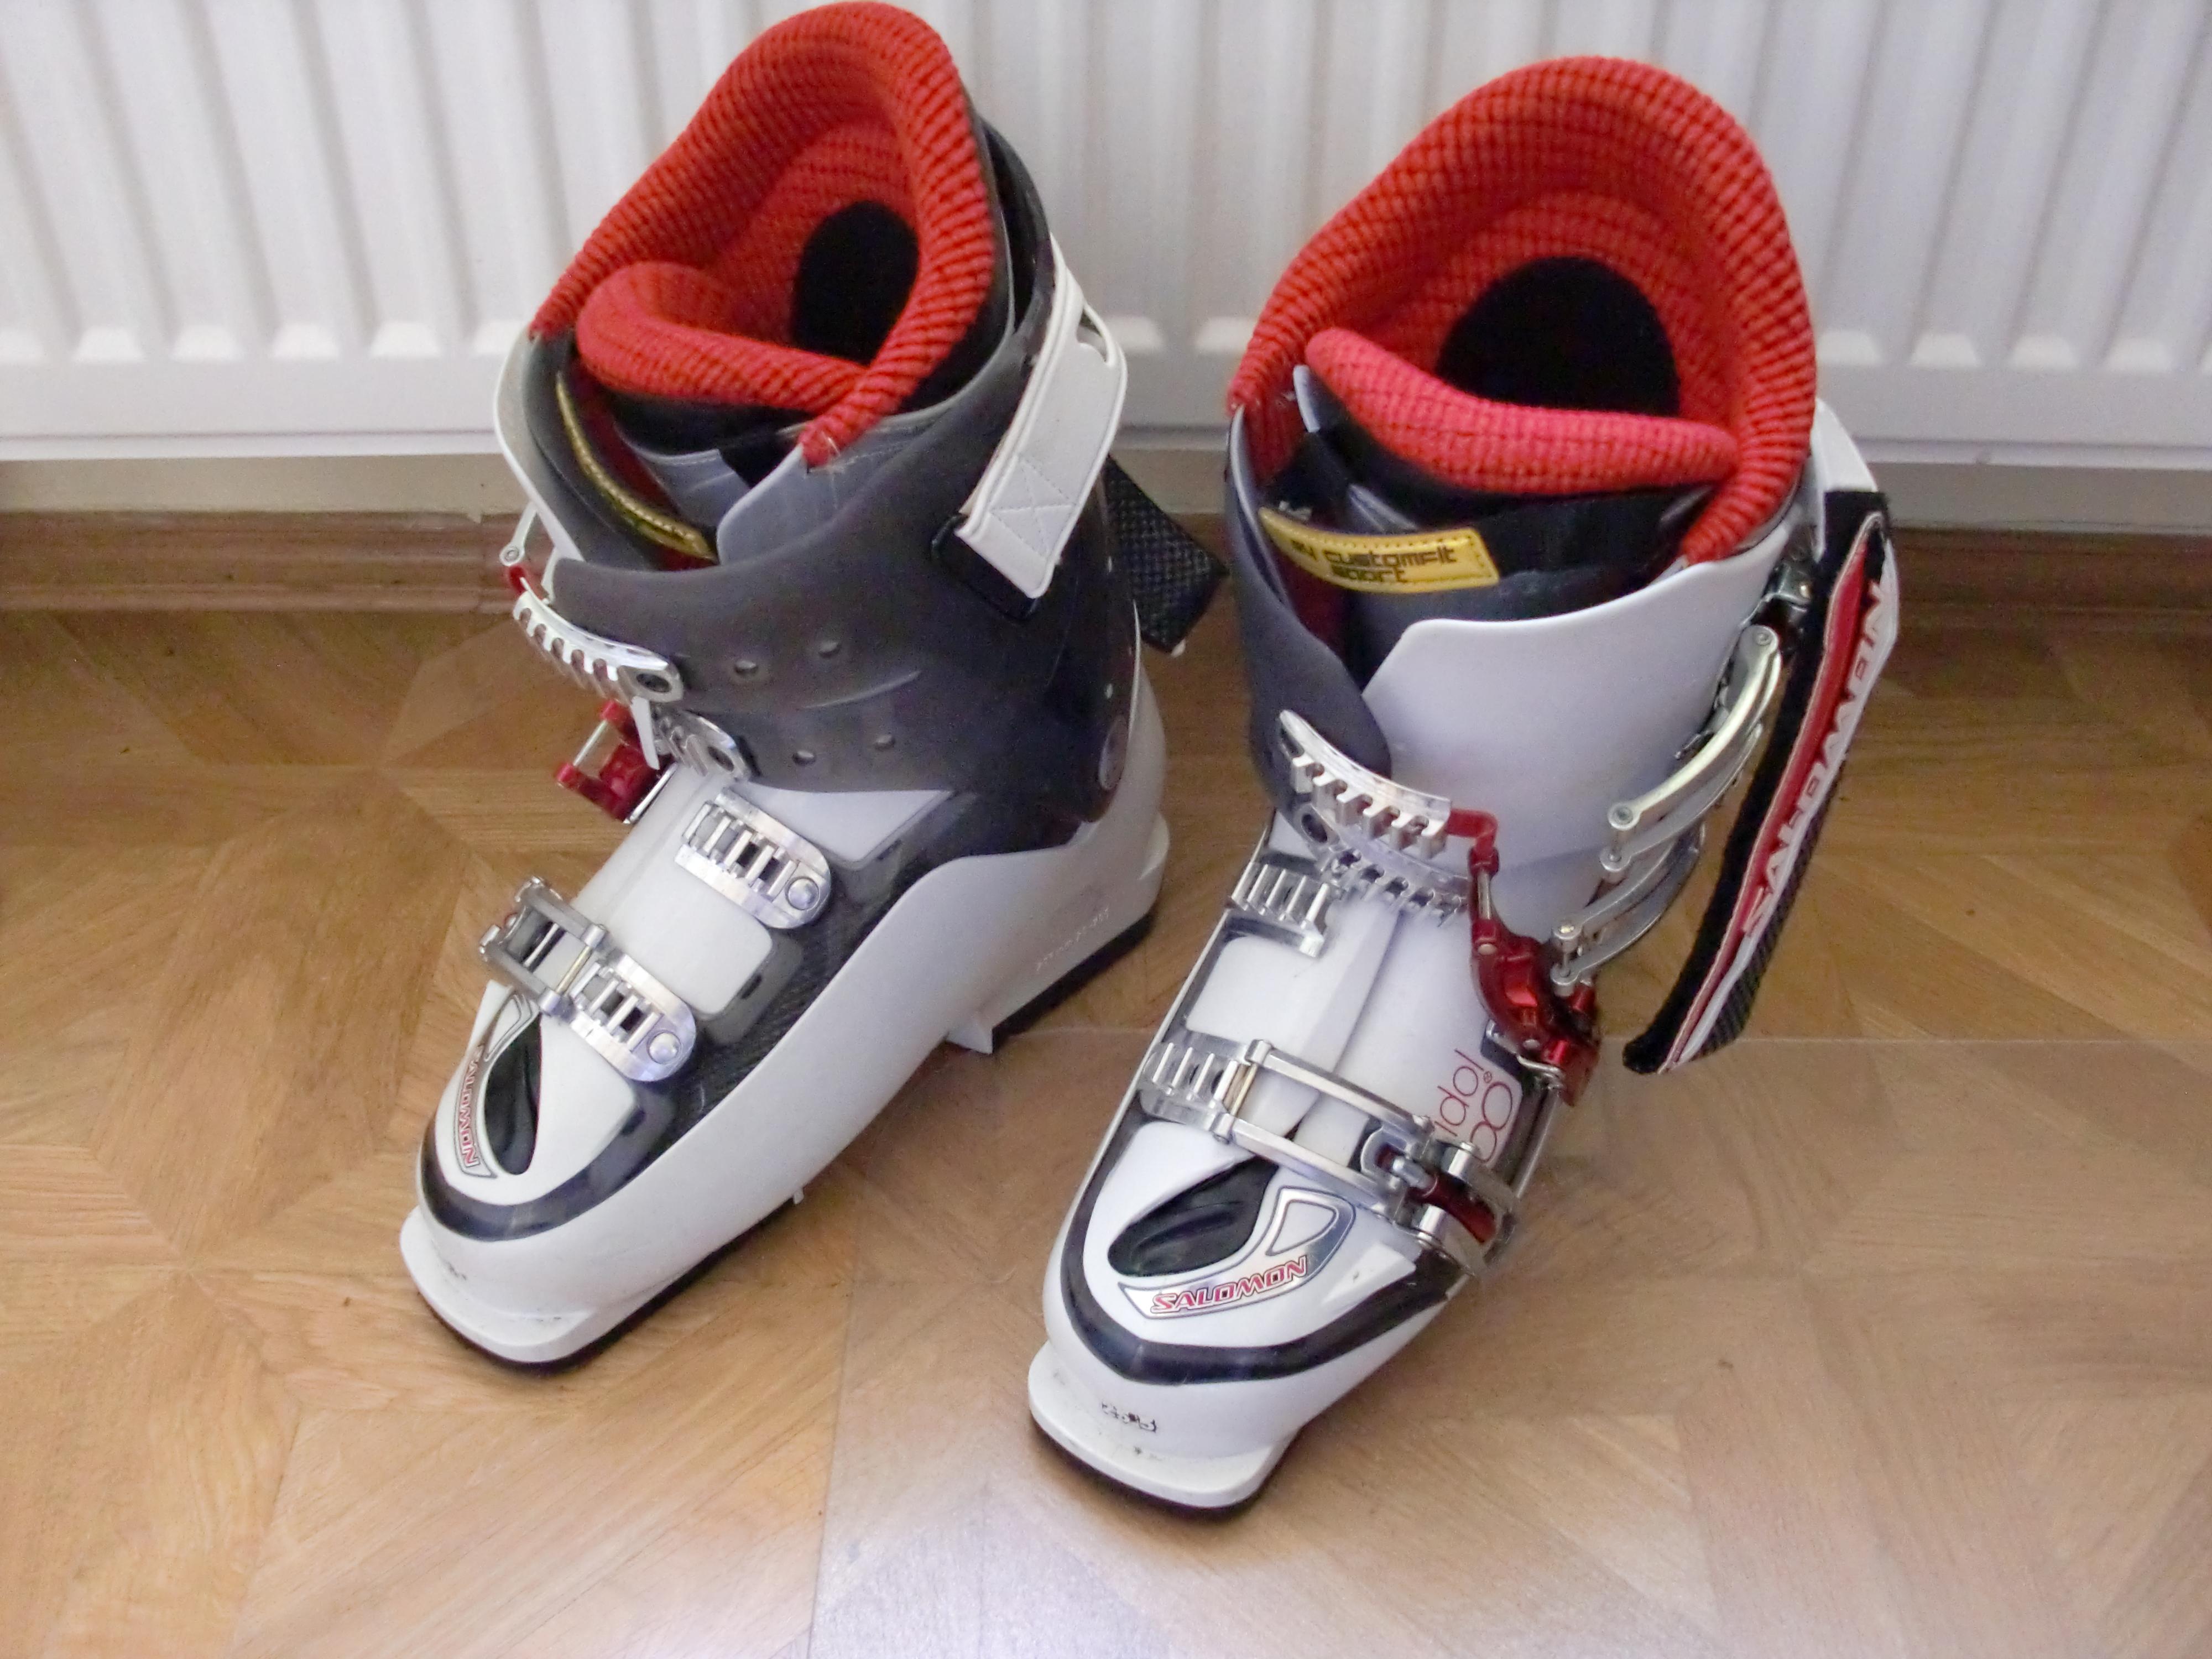 2d2e29e64c7 Dámské Lyžařské boty Salomon - Bazar - SNOW.CZ